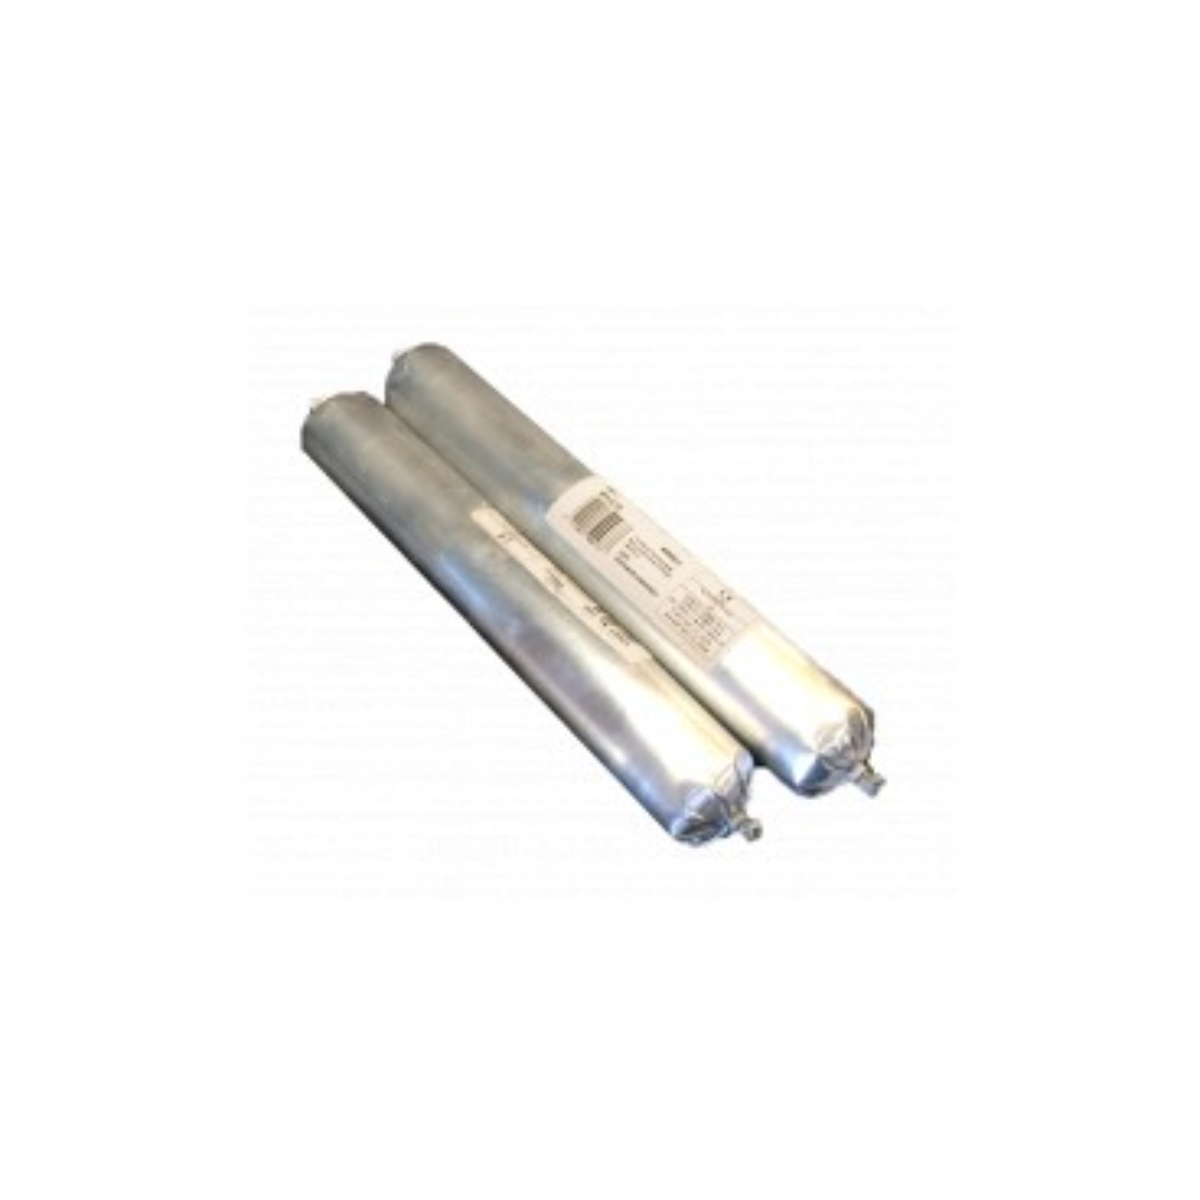 50FC - One Component Polyurethane Sealant / Adhesive